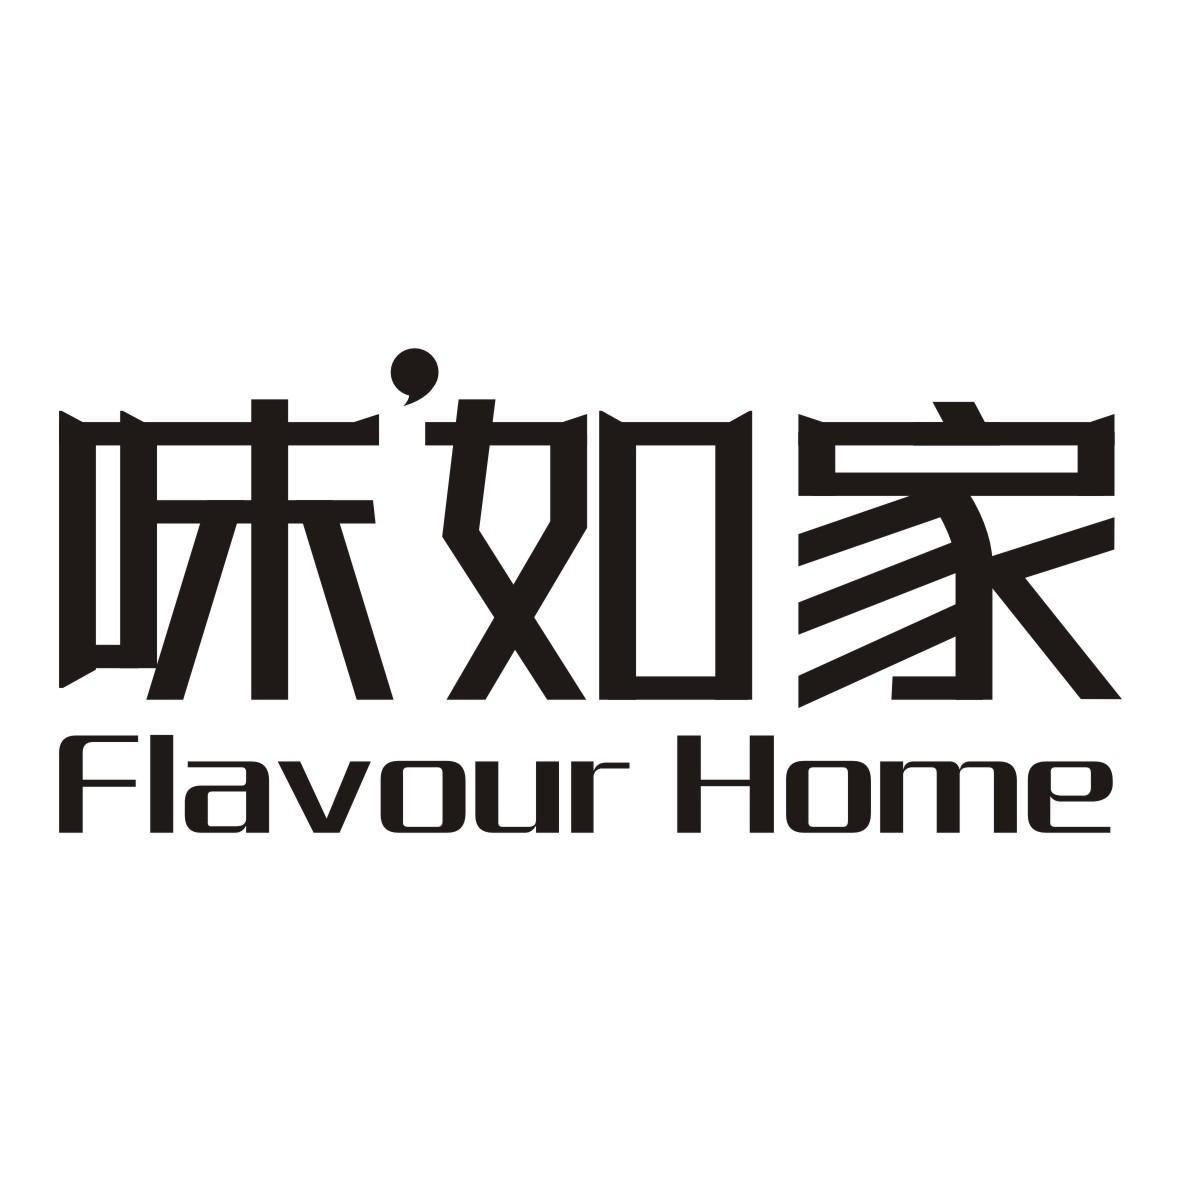 味如家 FLAVOUR HOME